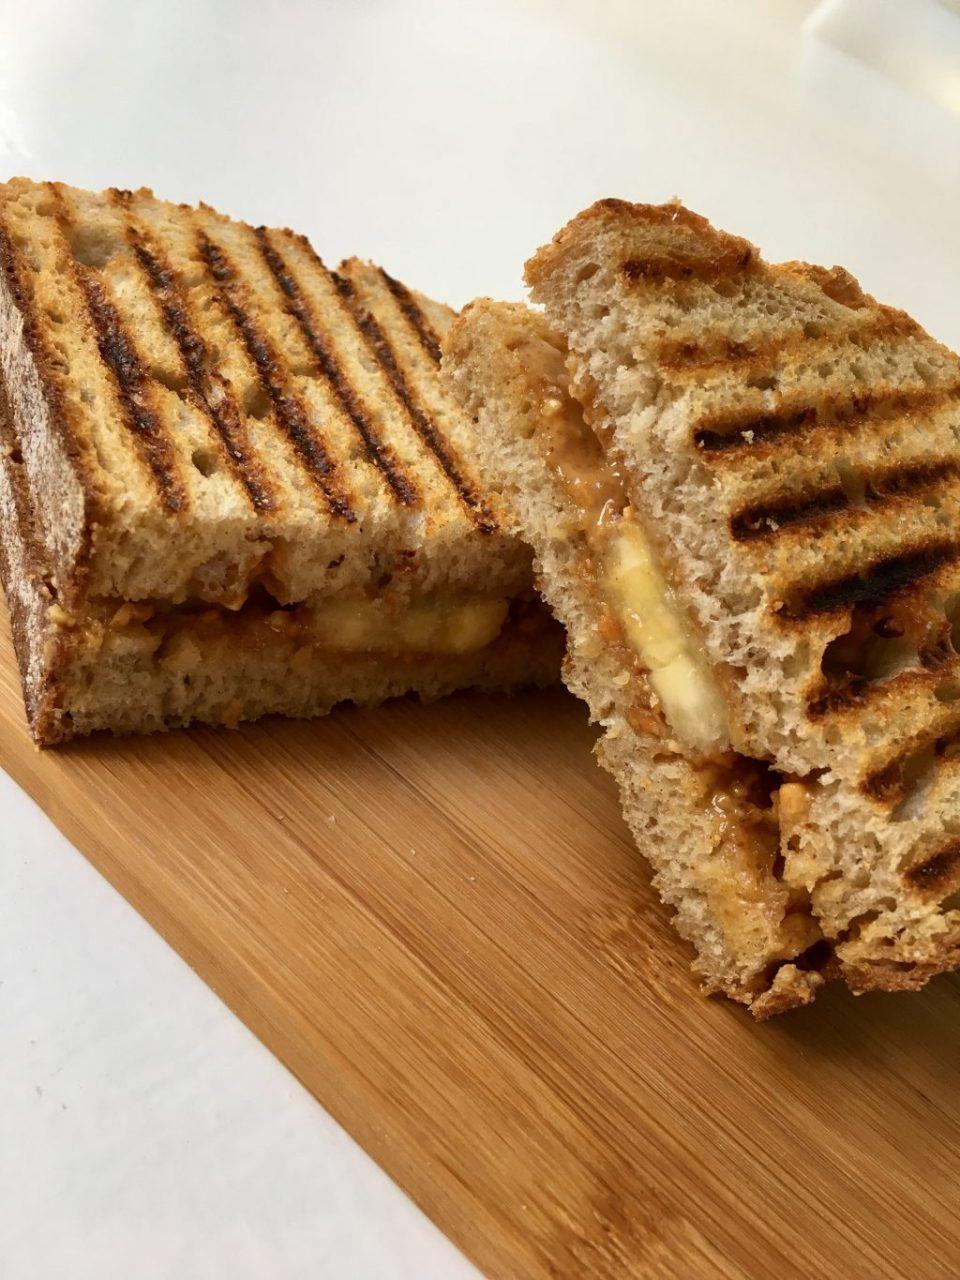 Broodrecept: 3x zoete tosti